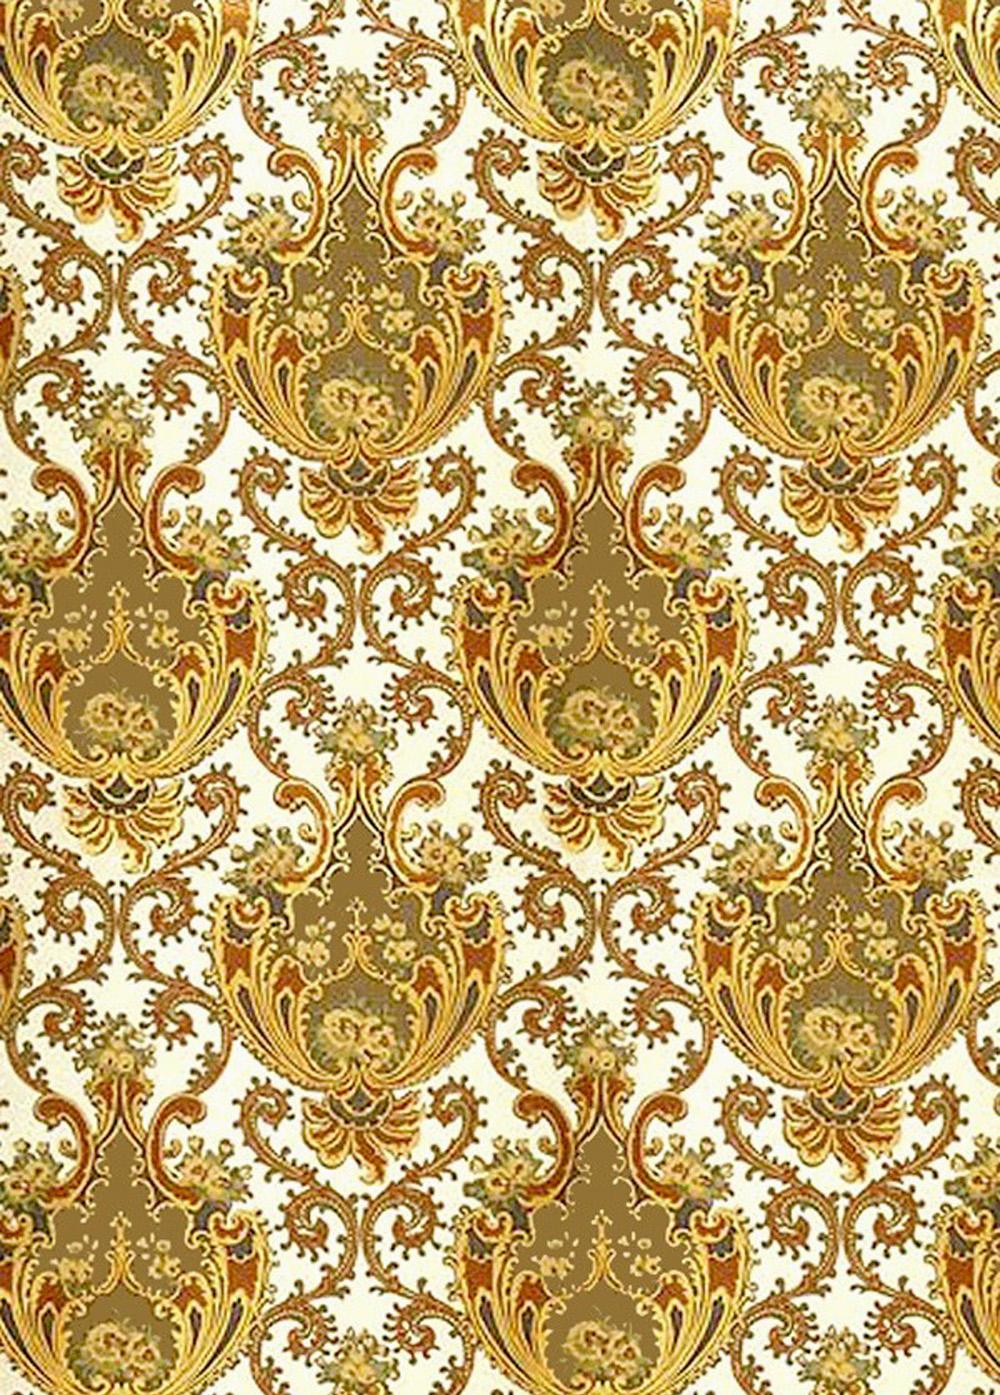 Victorian Wallpaper Designs – Free wallpaper download